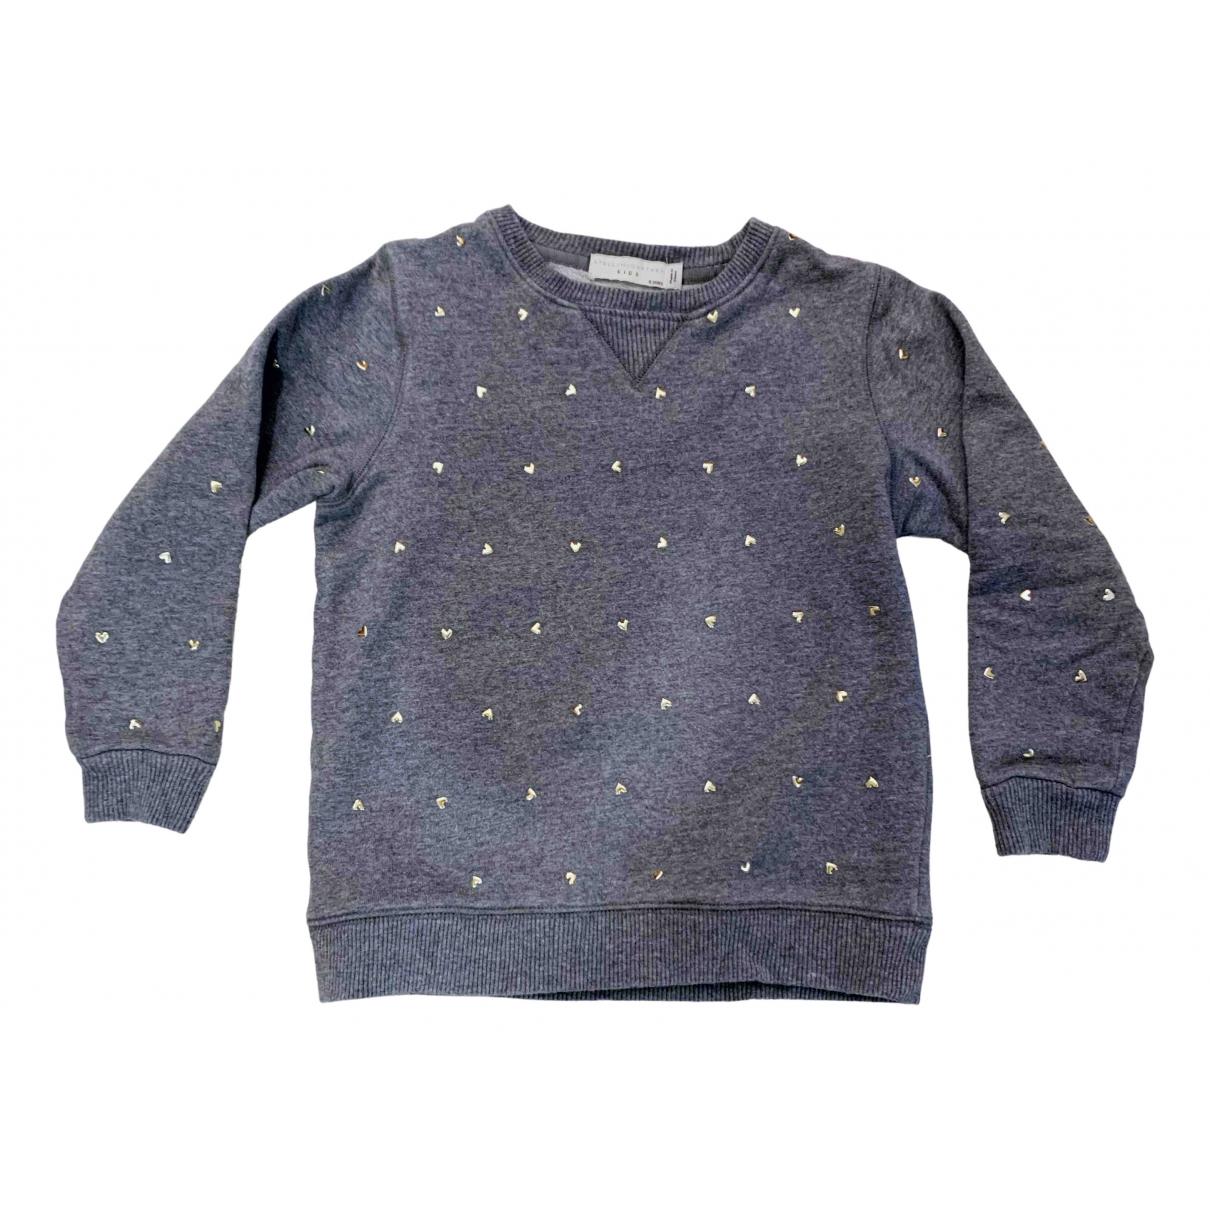 Stella Mccartney N Grey Cotton Knitwear for Kids 6 years - up to 114cm FR